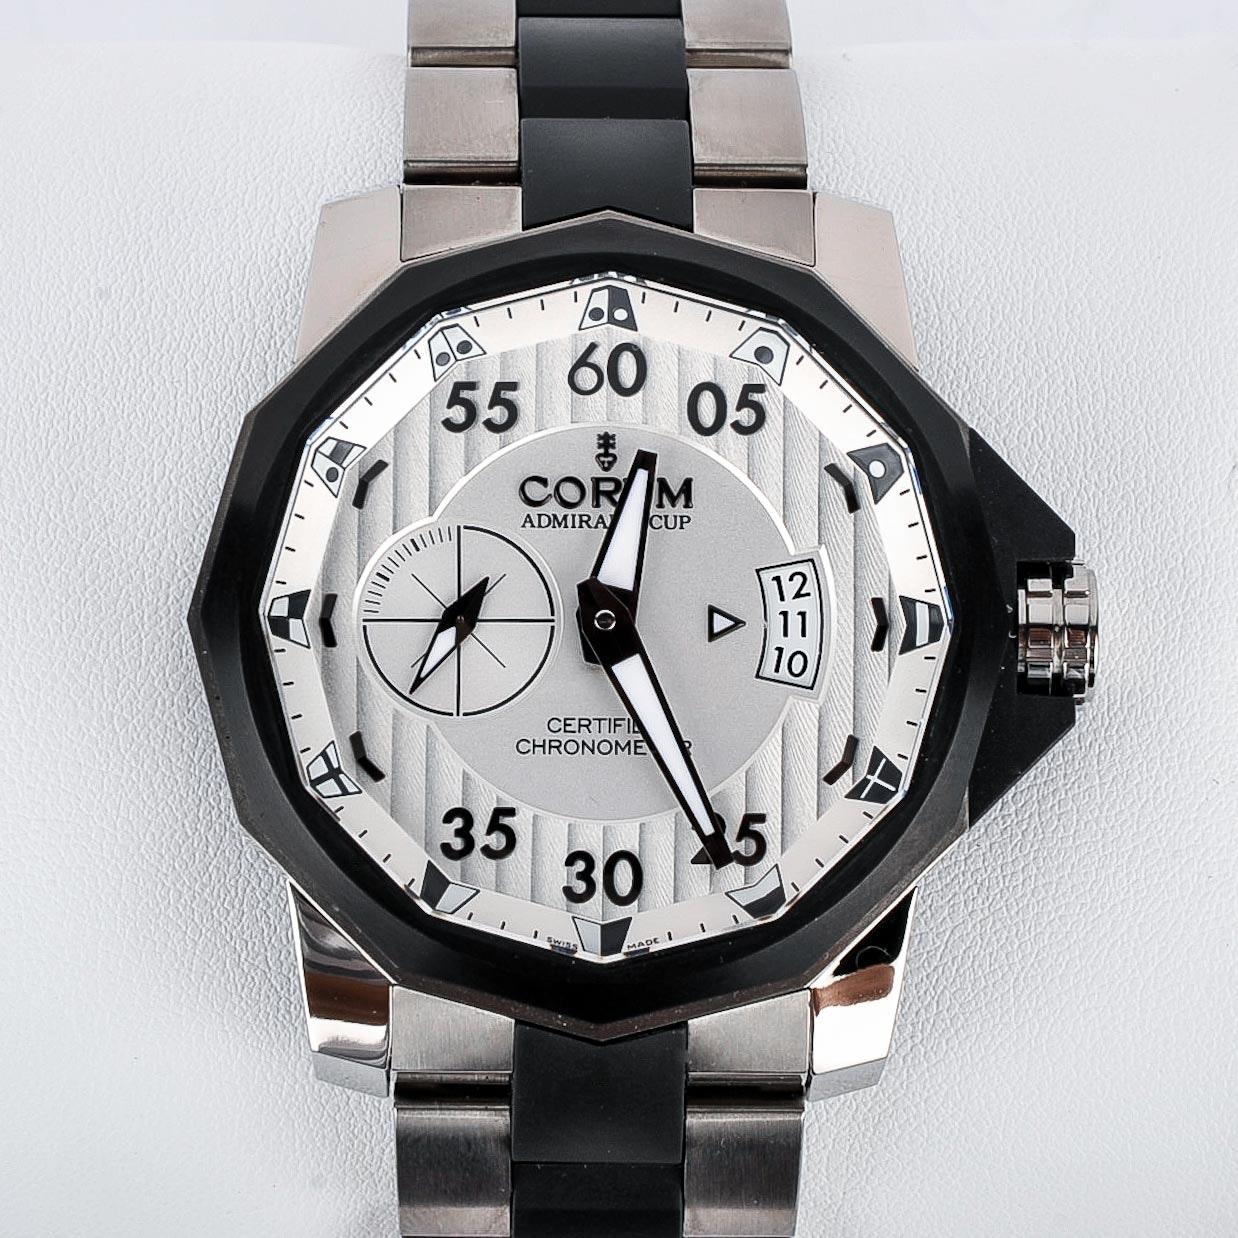 Men's Corum Chronometer Wristwatch